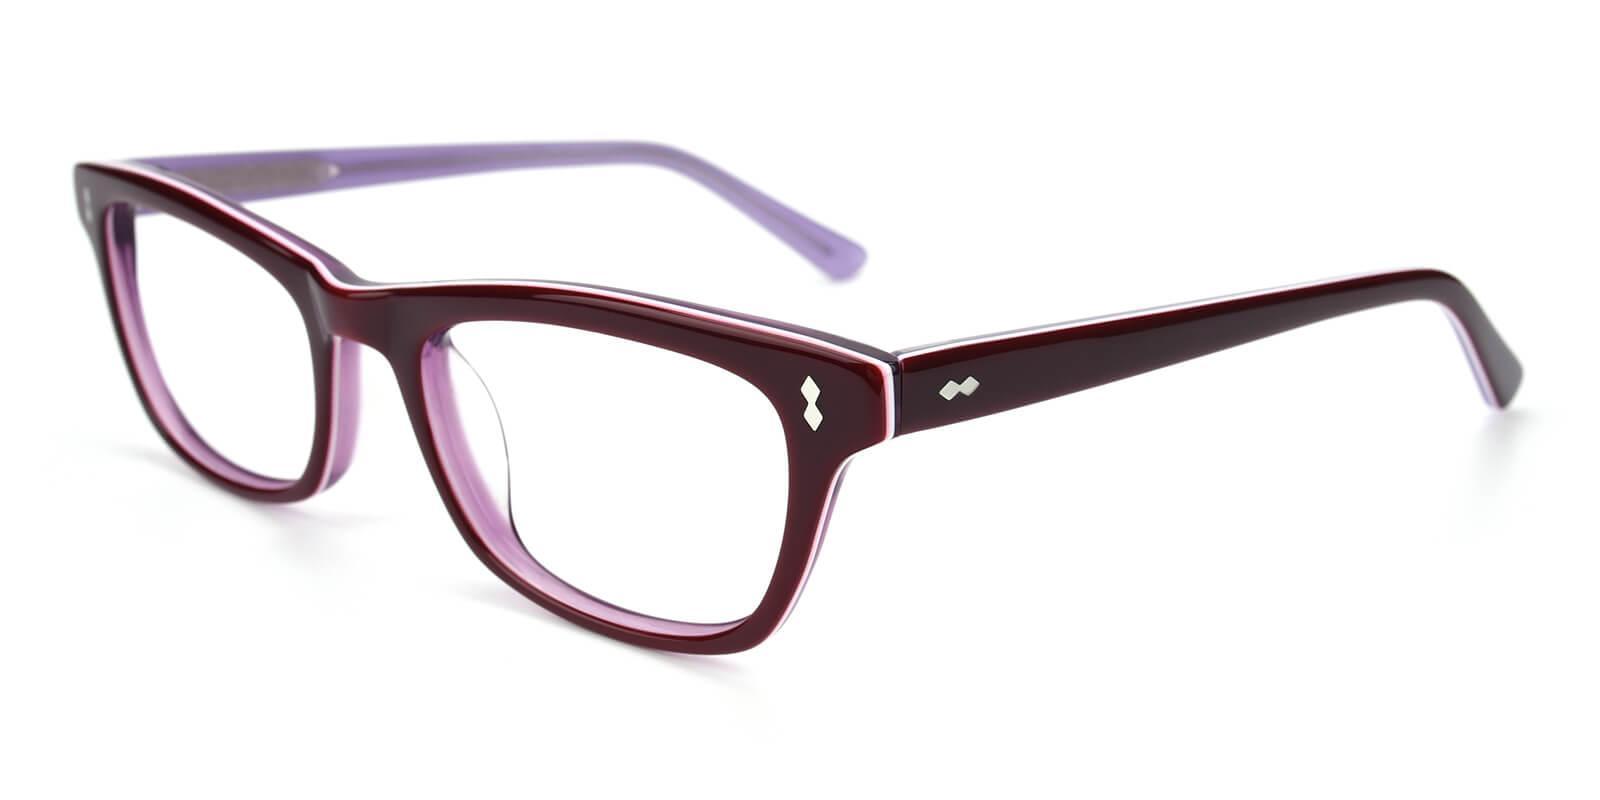 Leavary-Purple-Rectangle-Acetate-Eyeglasses-additional1